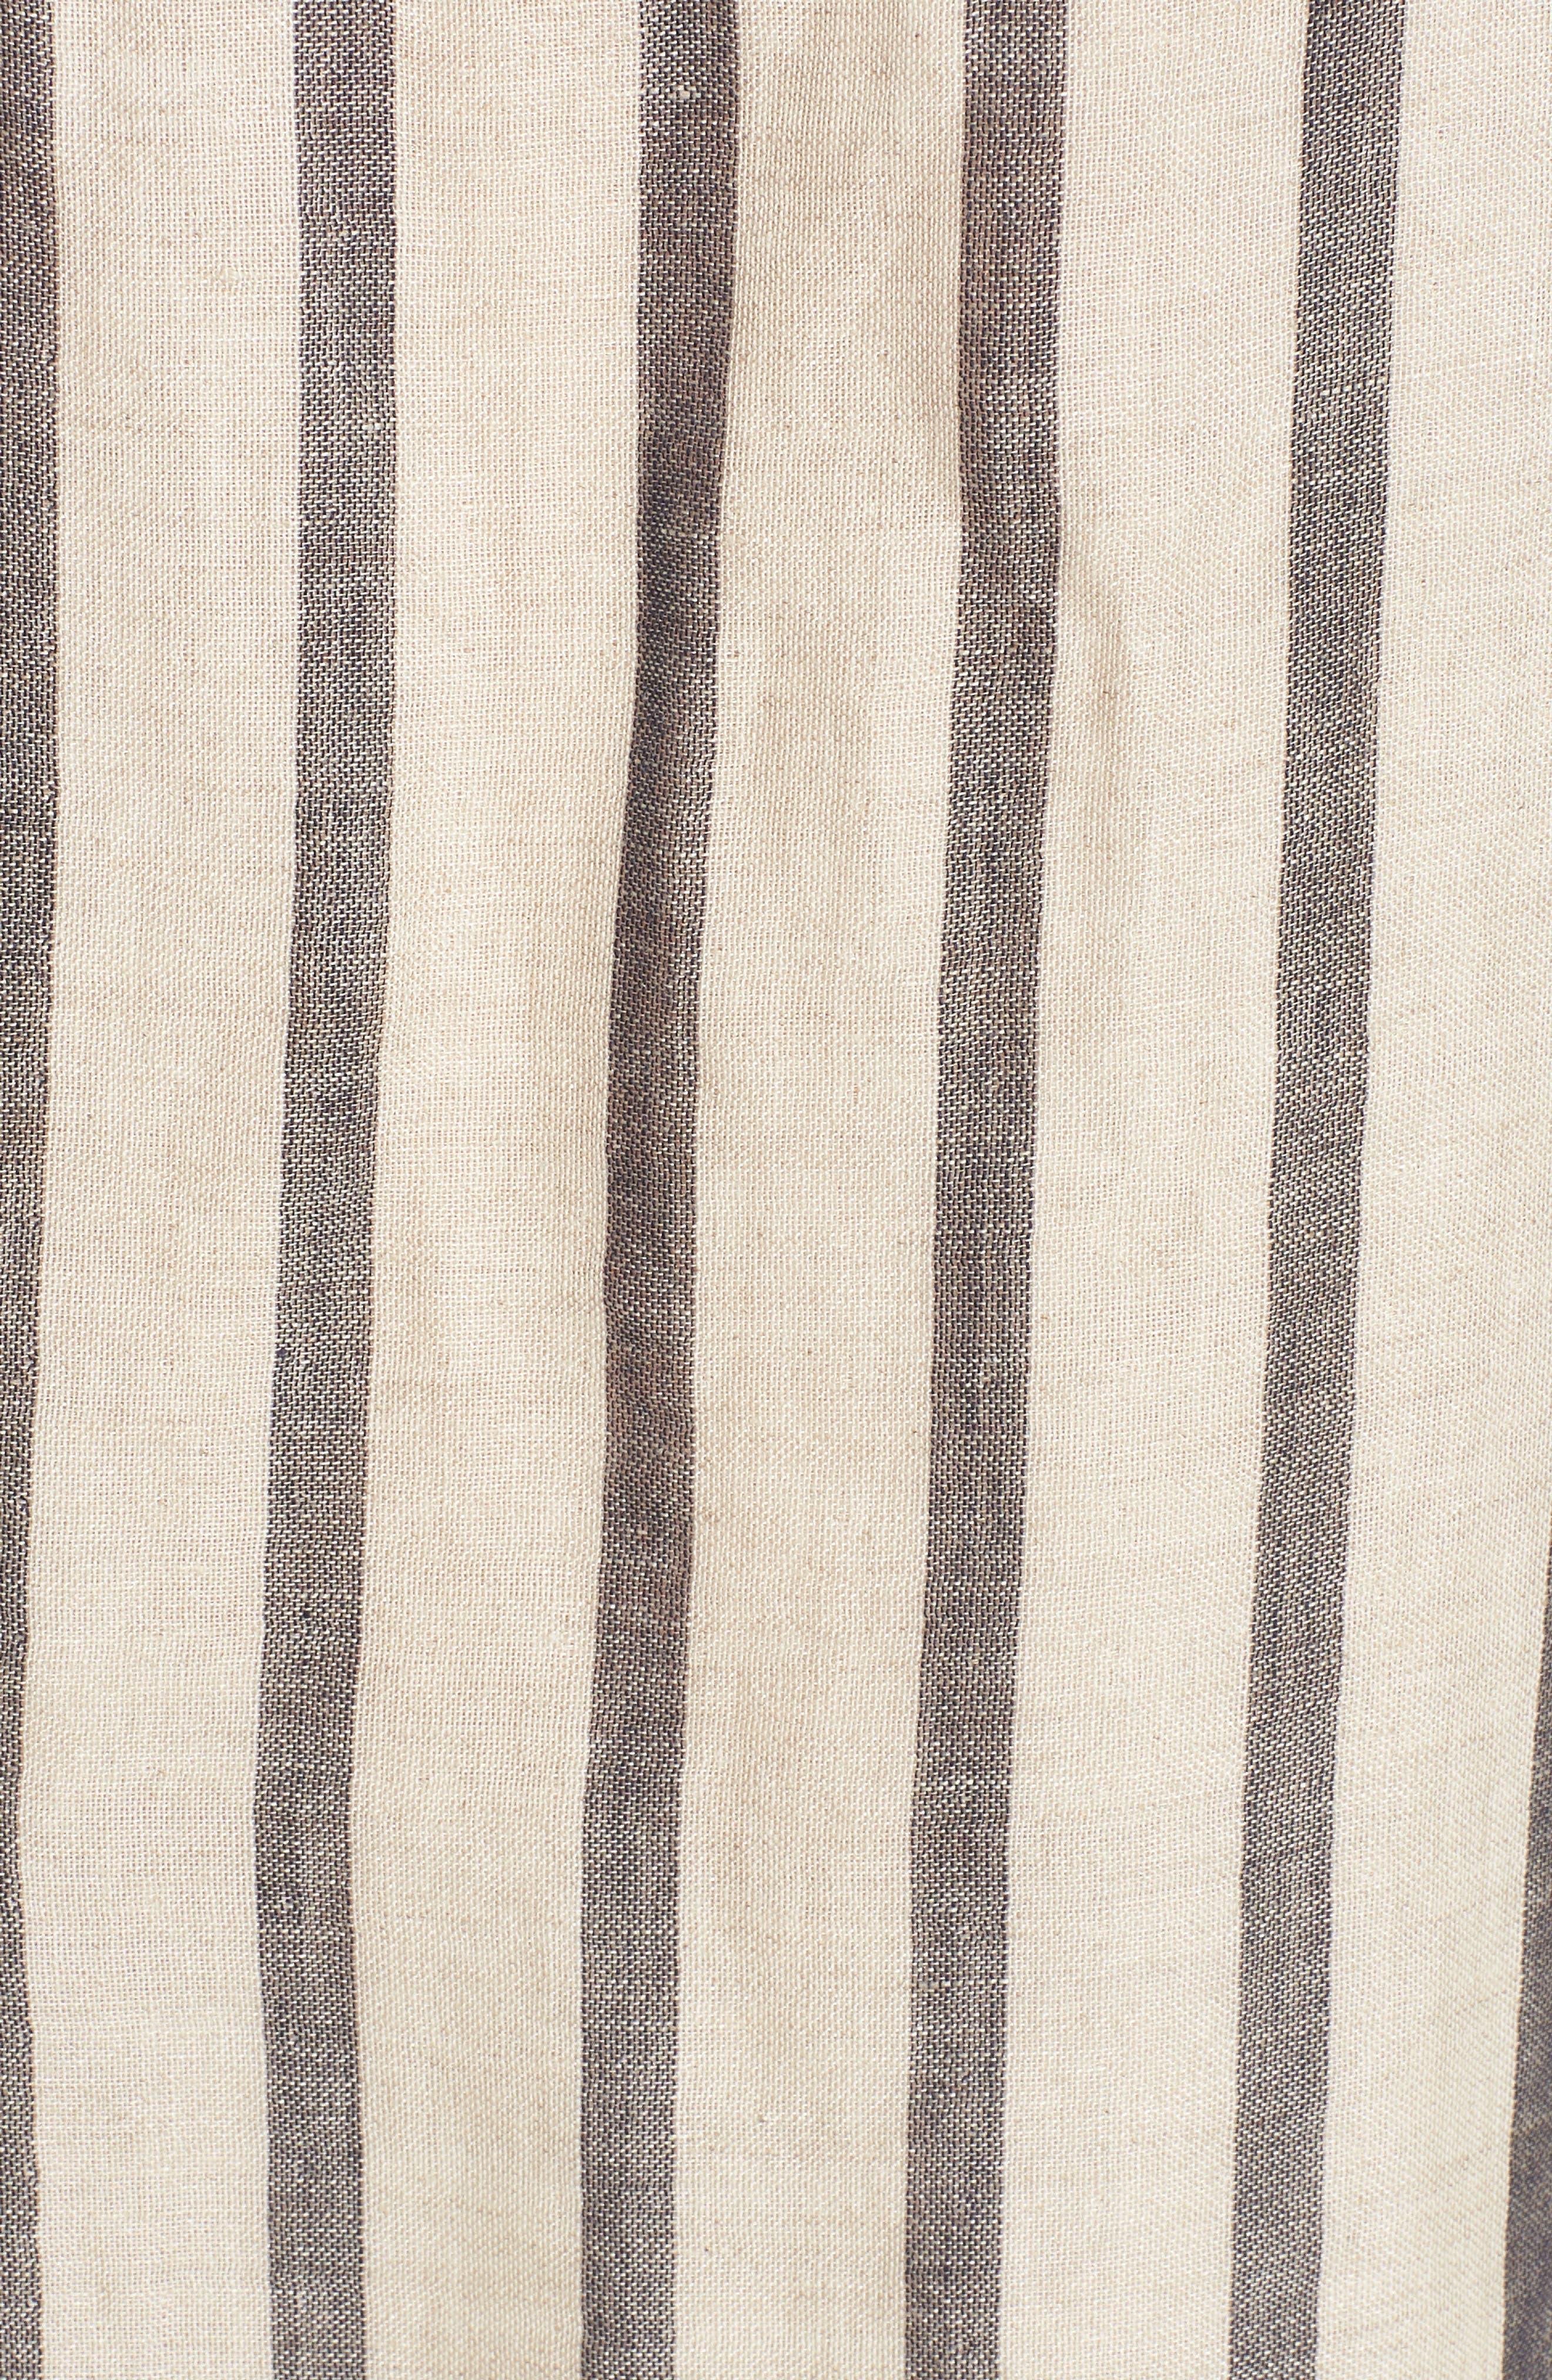 Stripe Linen & Cotton Shift Dress,                             Alternate thumbnail 5, color,                             257